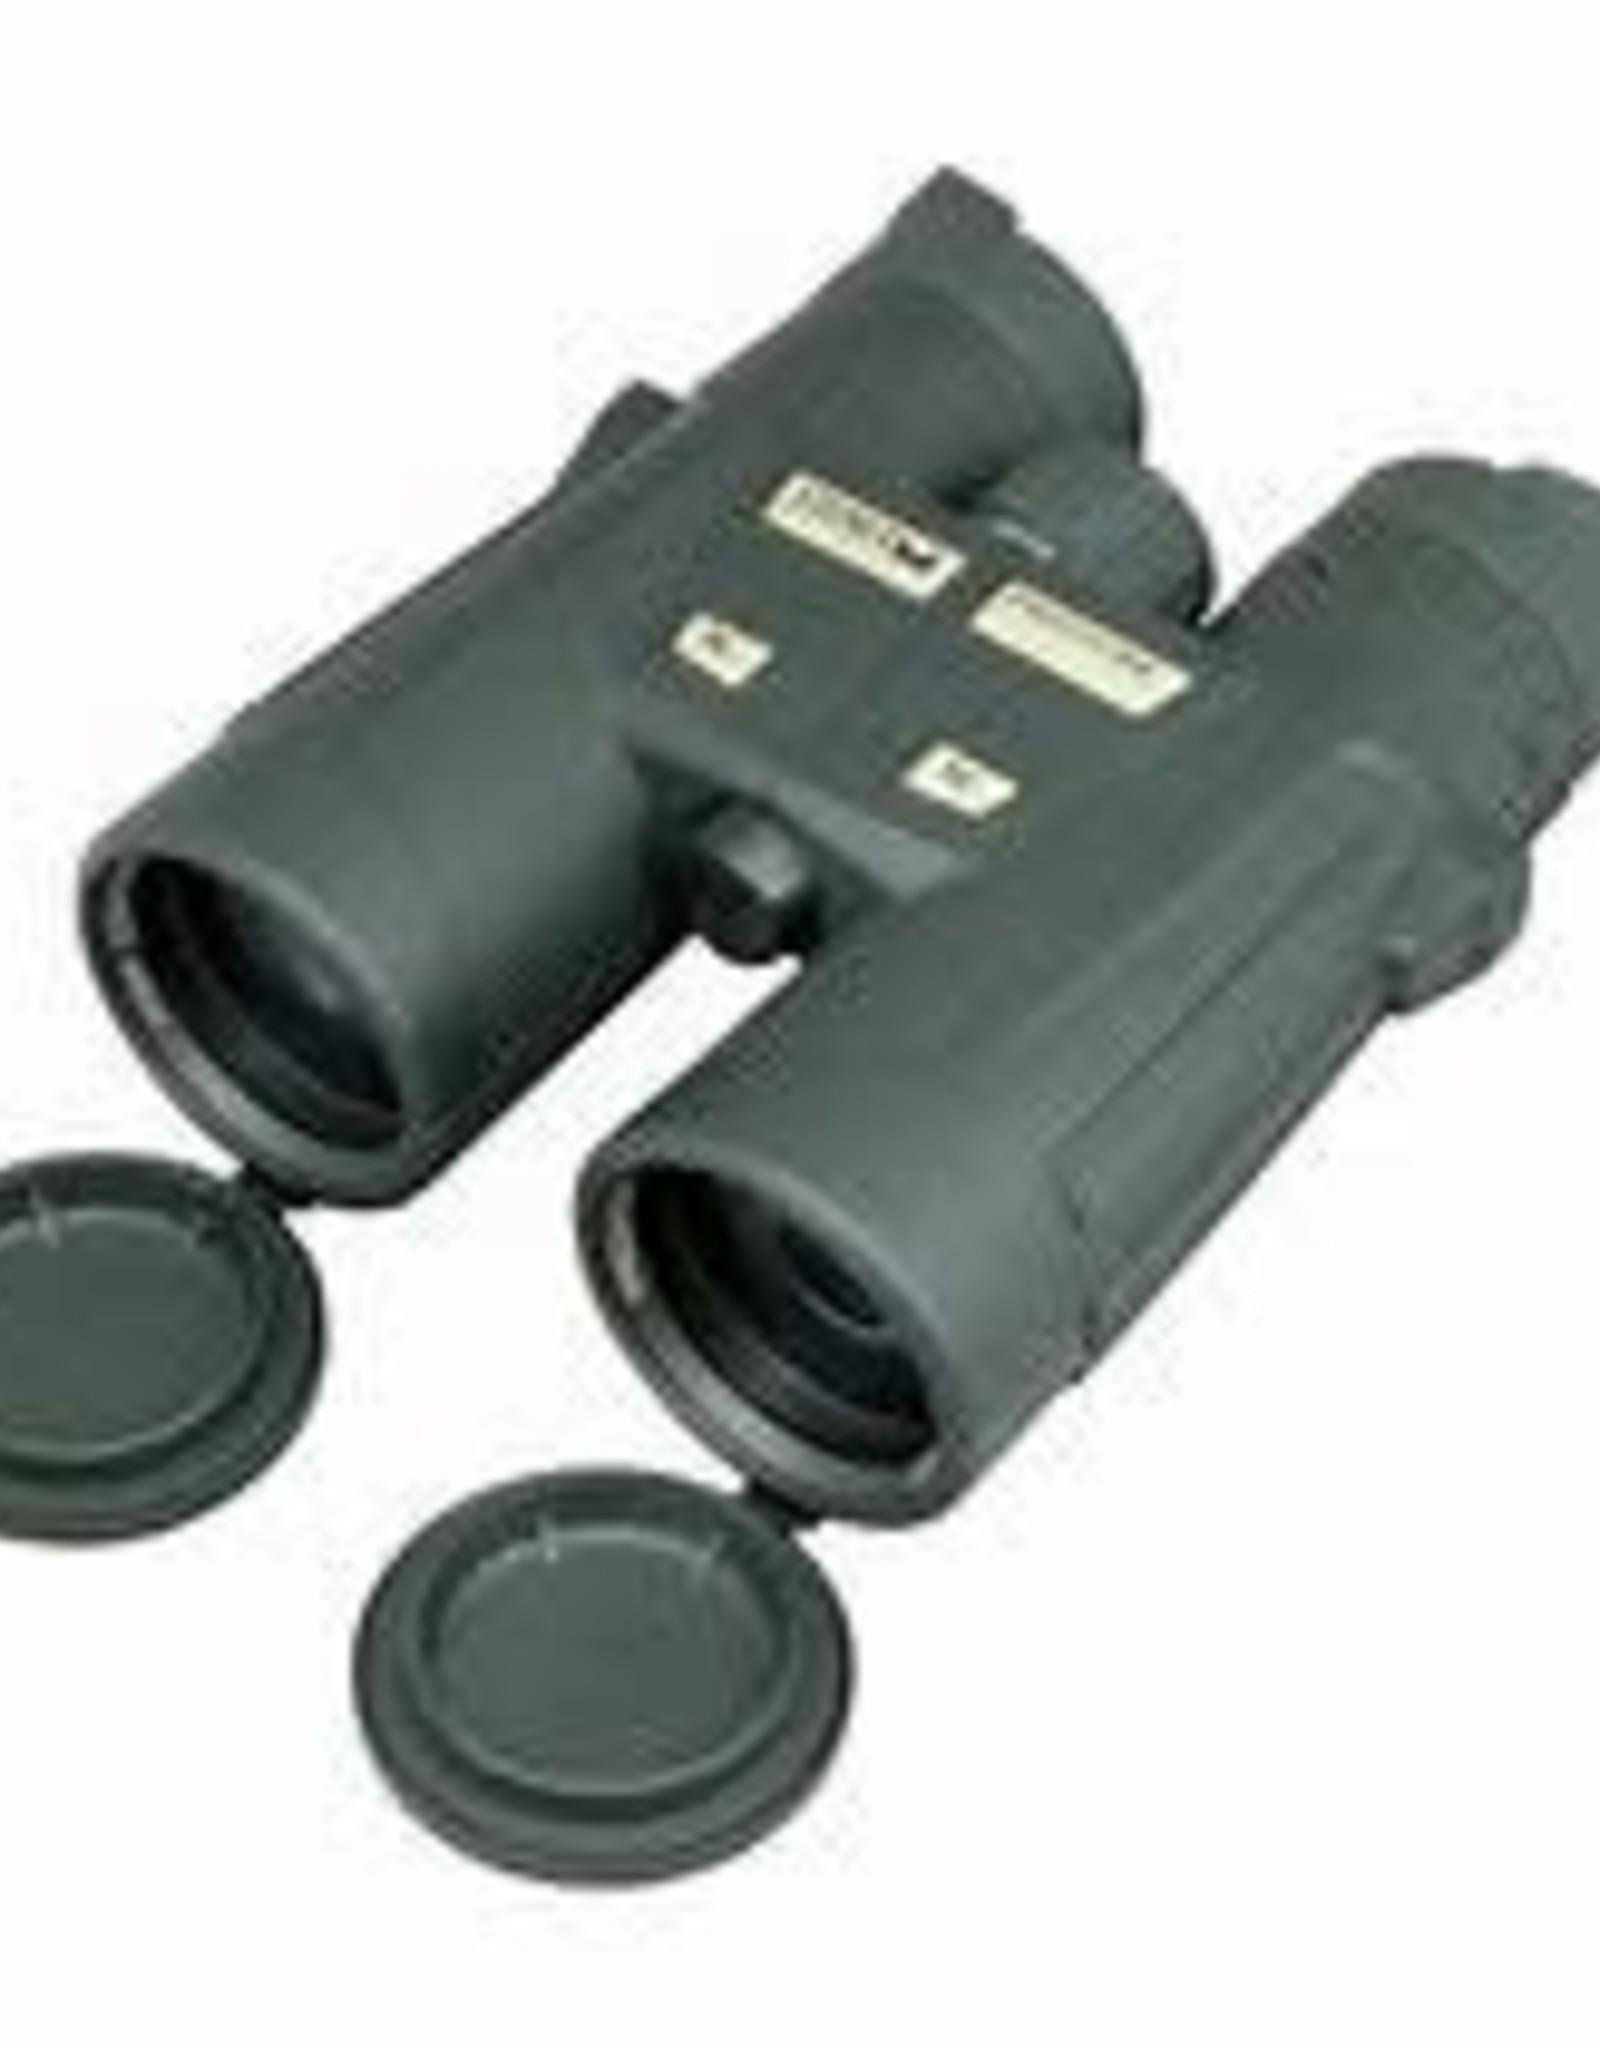 Steiner 70th Anniversary Limited Edition Predator 10x42 Binoculars with LED Lenser Flashlight